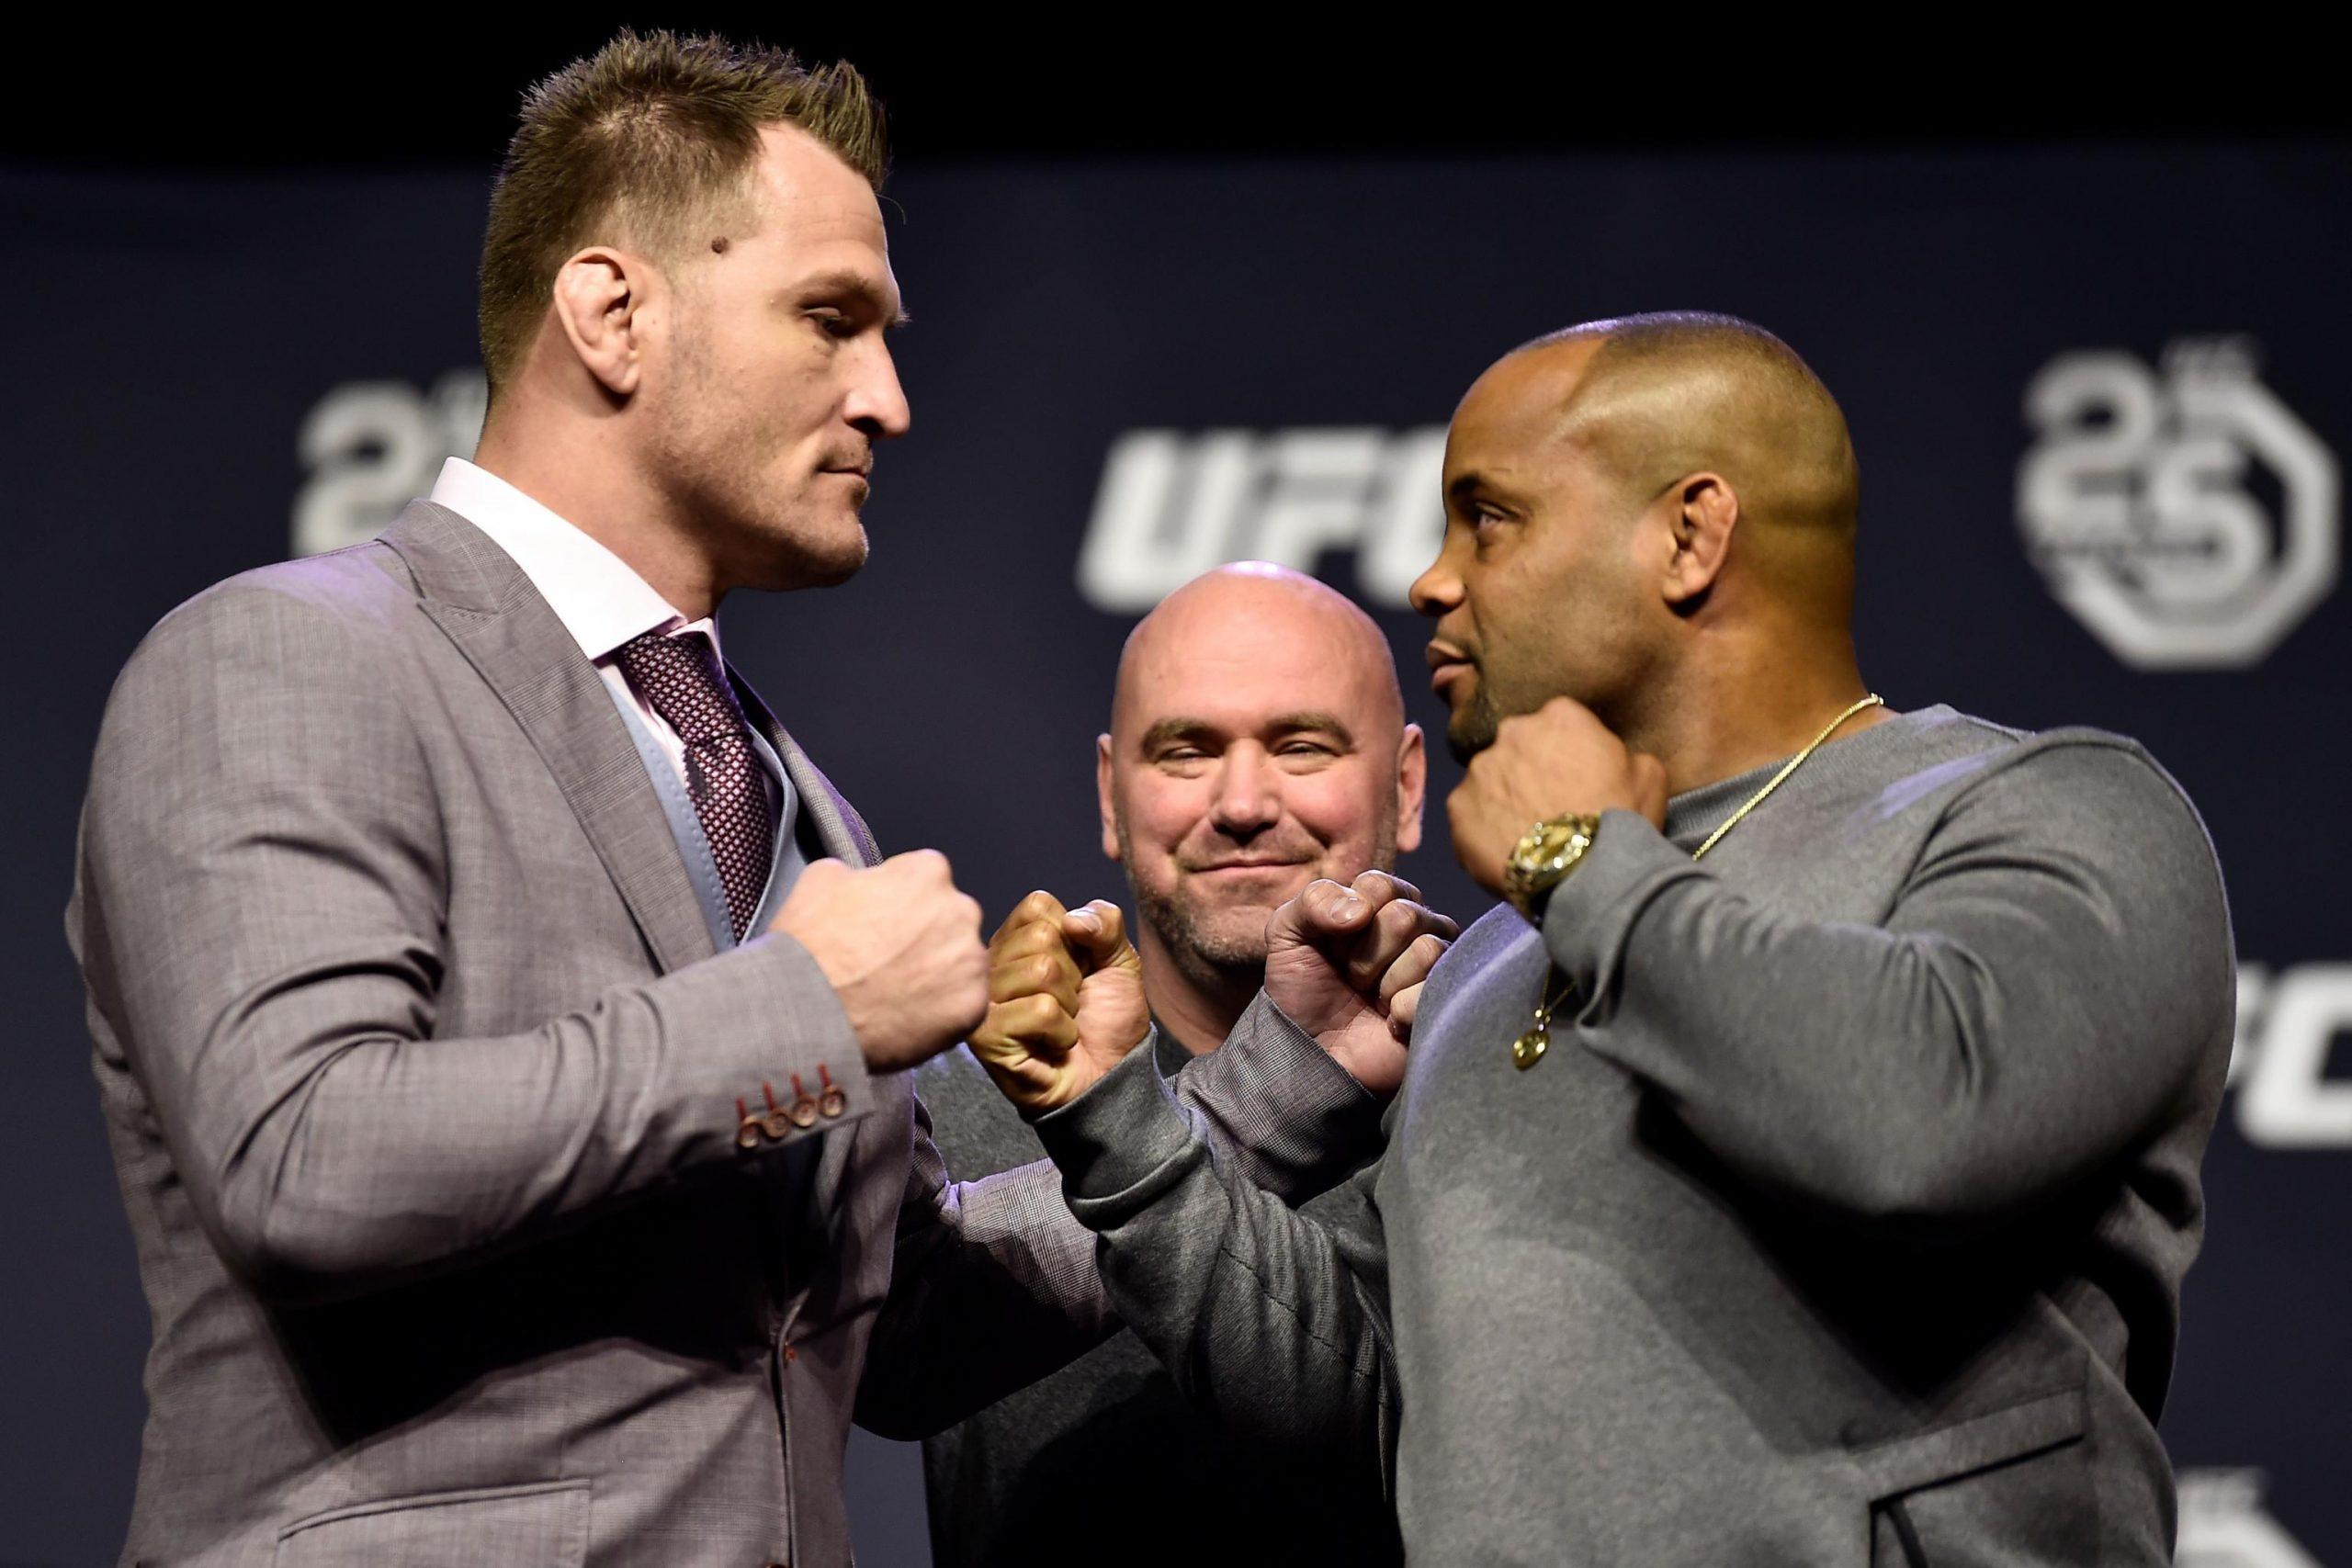 UFC 252: Миочич vs Кормье